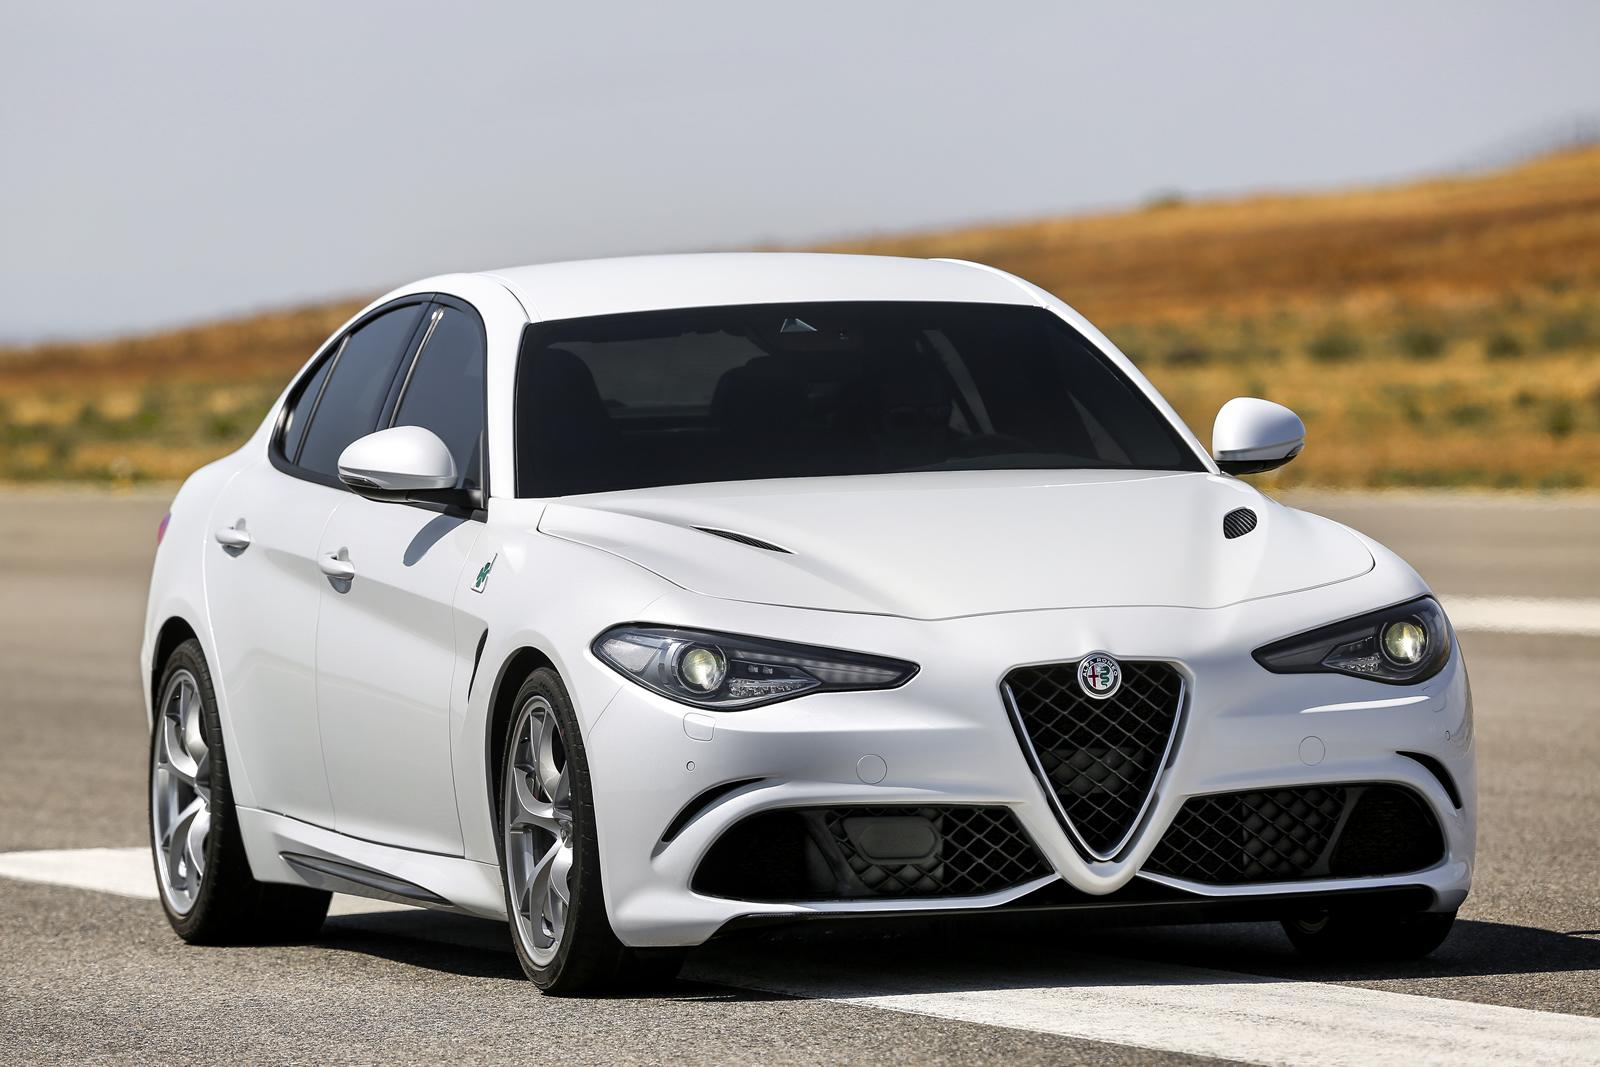 Alfa Romeo Giulia U Prodaji Tek Za Godinu Dana  Auto Magazin